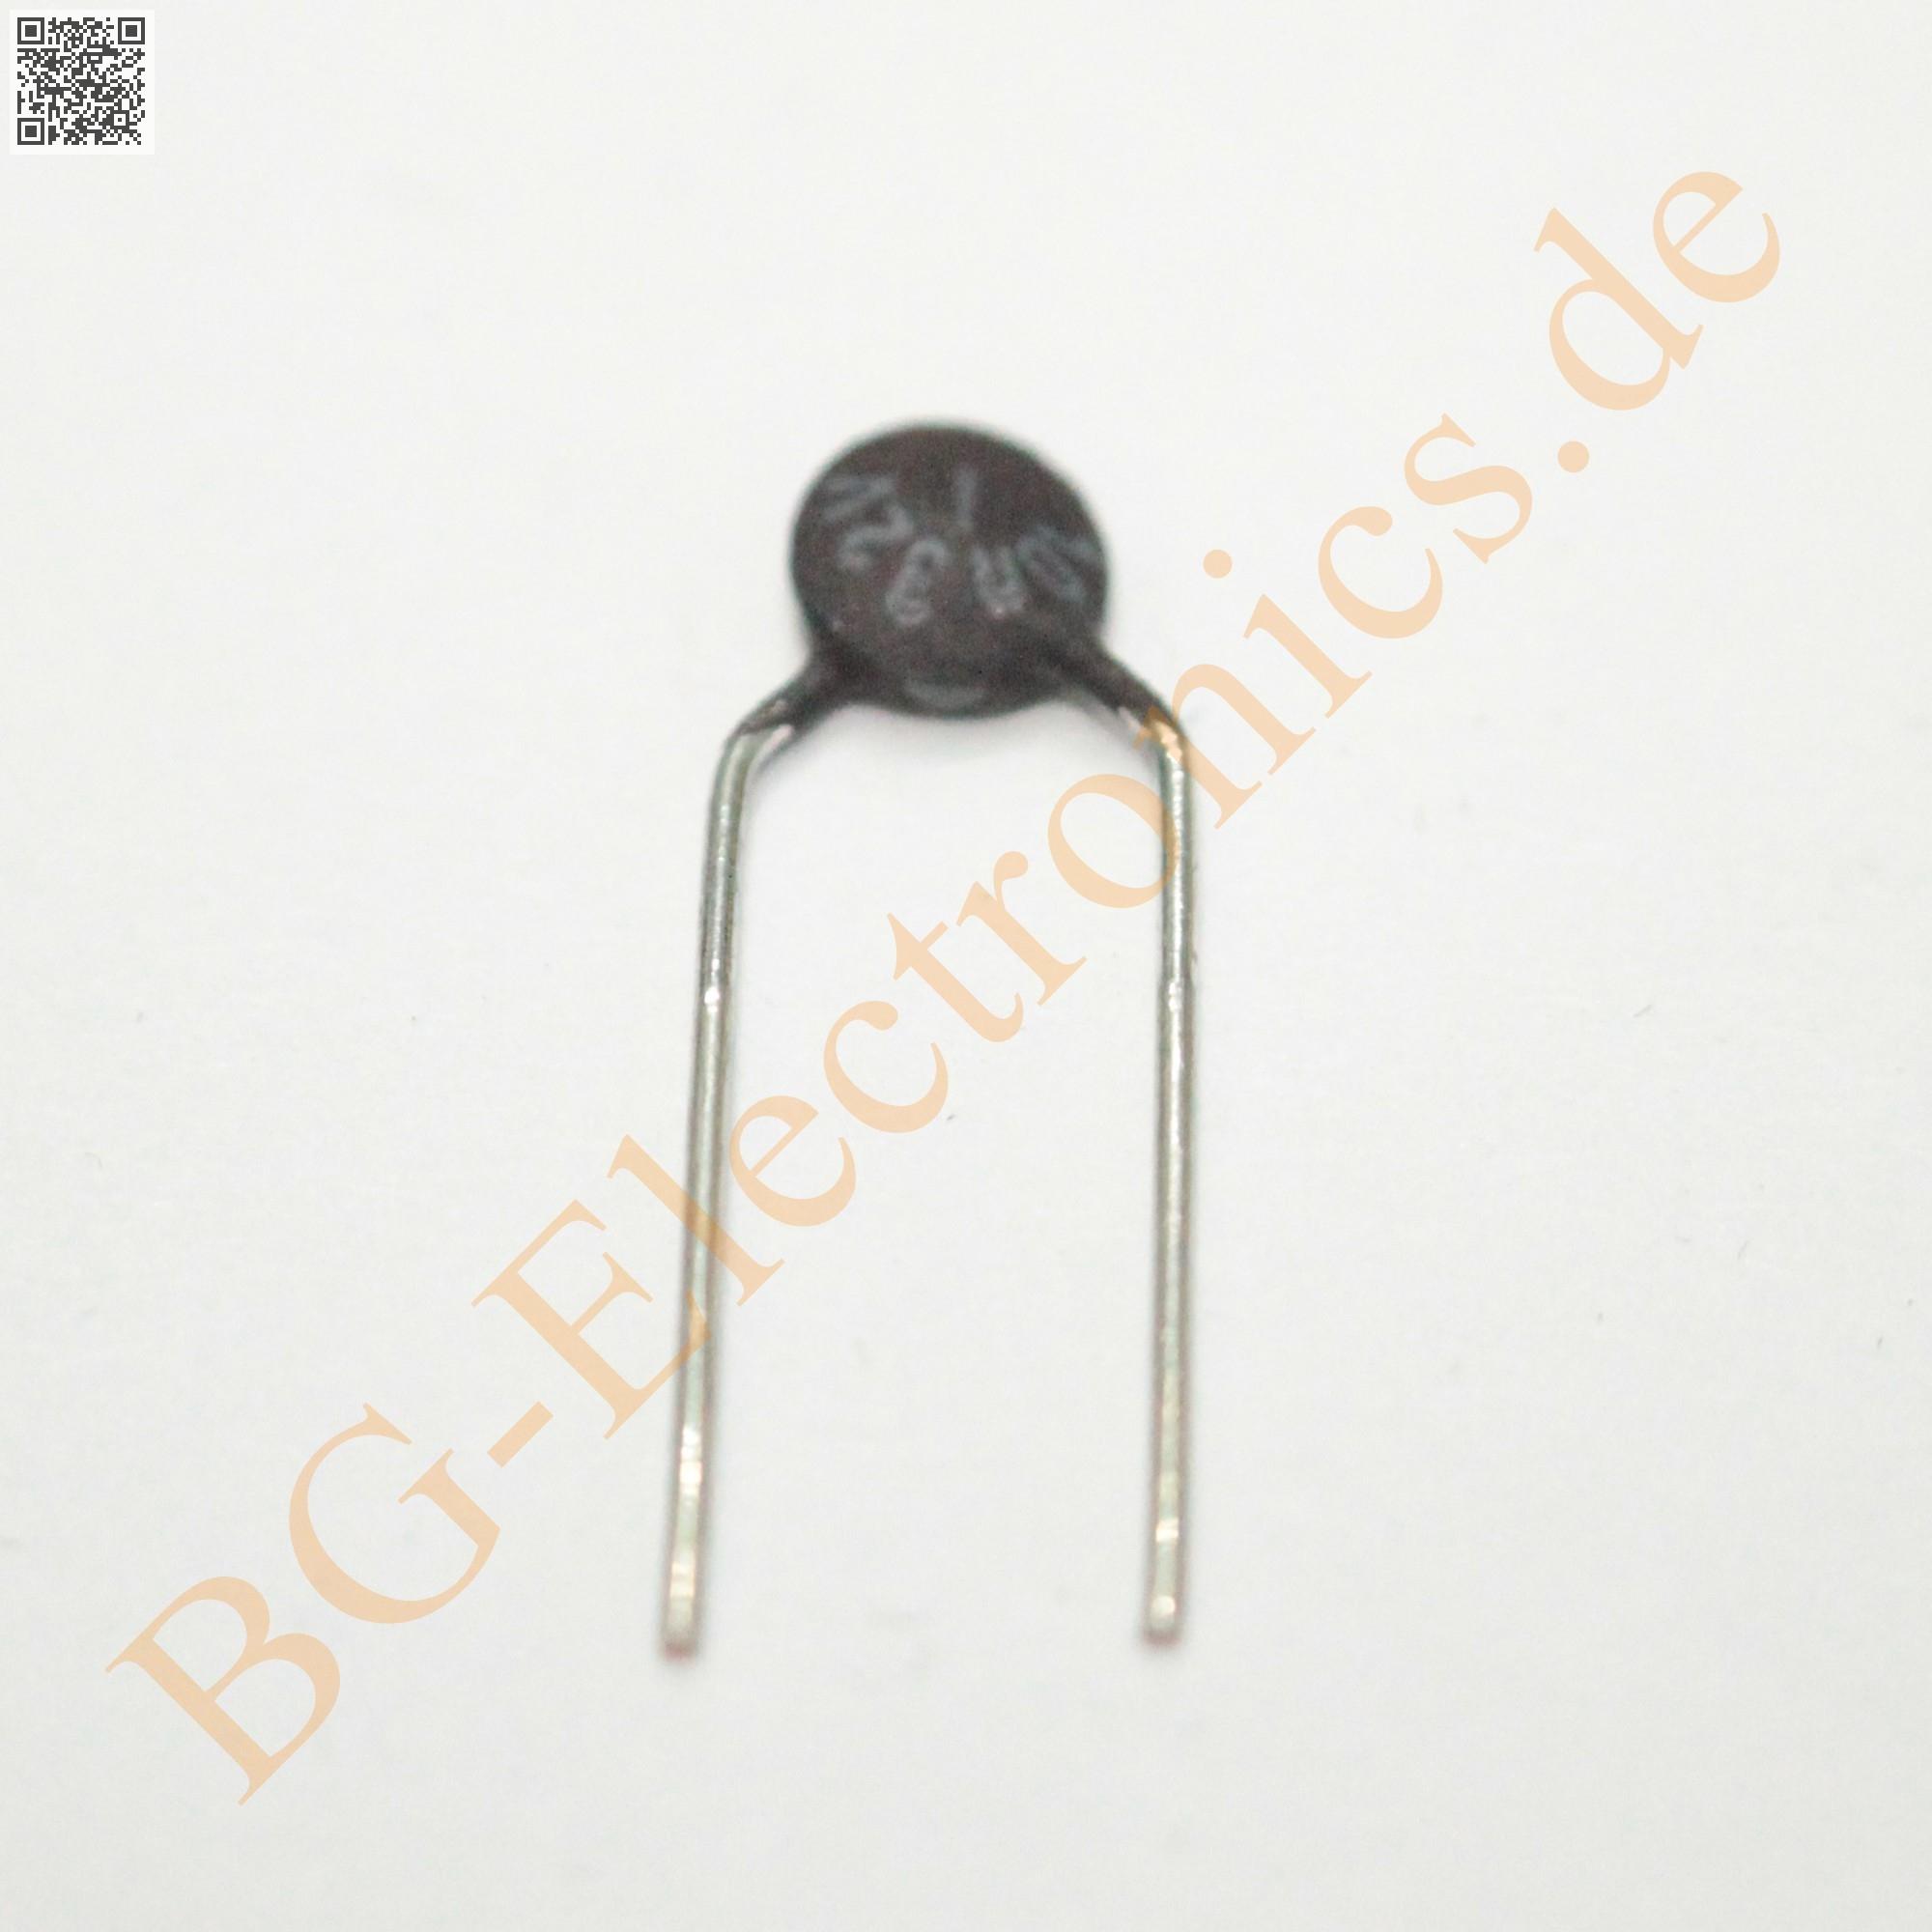 50 x 10nF 32V RM5 0.010µF 0.010uF Keramik Kondensator Capaci Roederste  50pcs